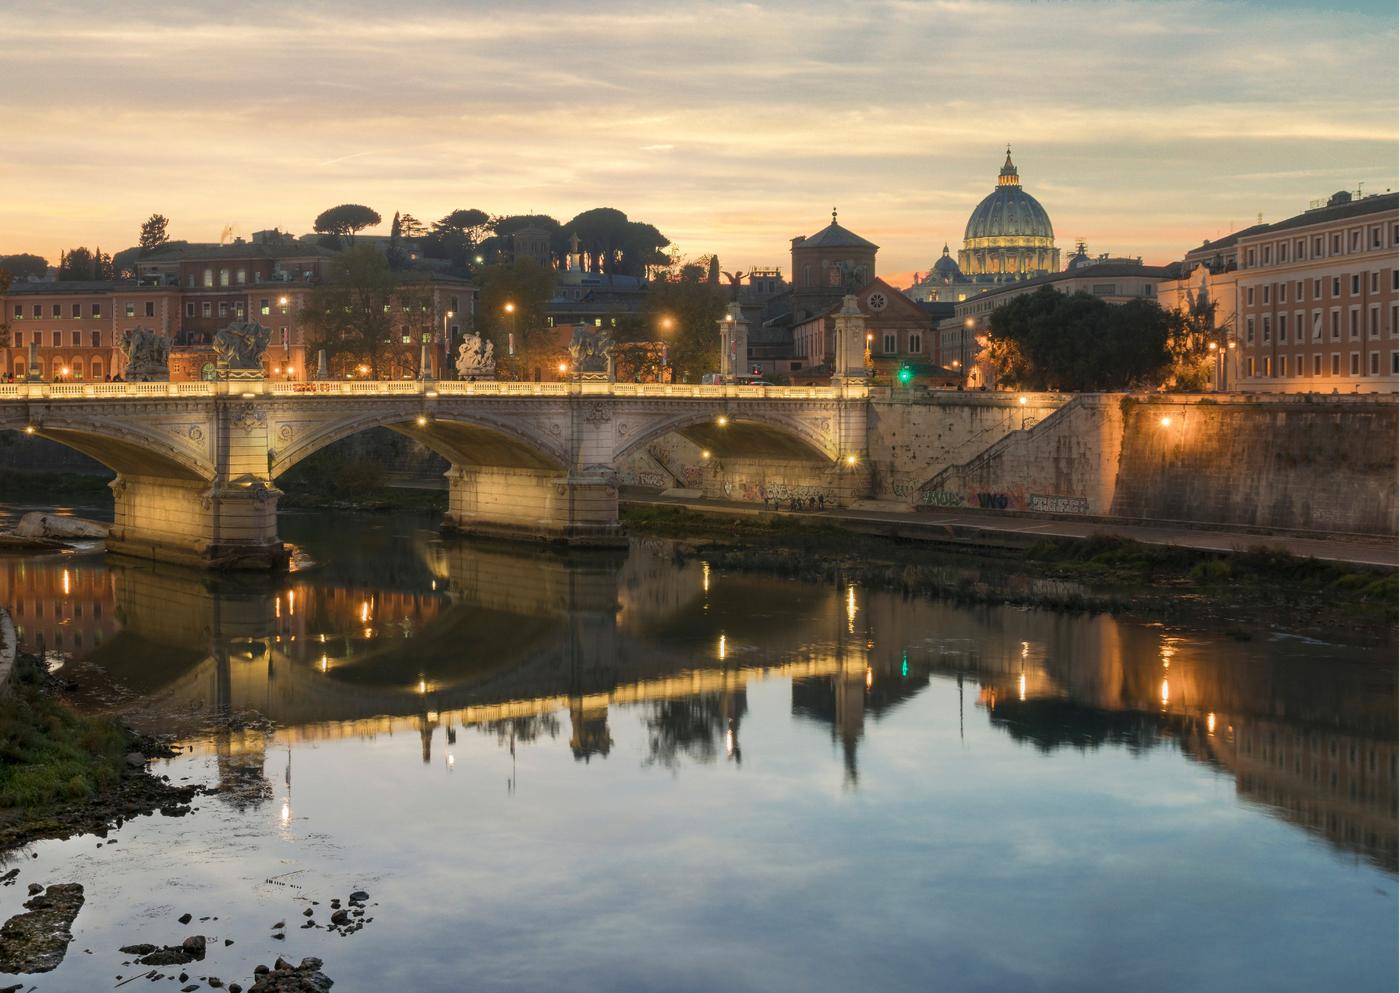 St. Peter's Basilica and River Tiber